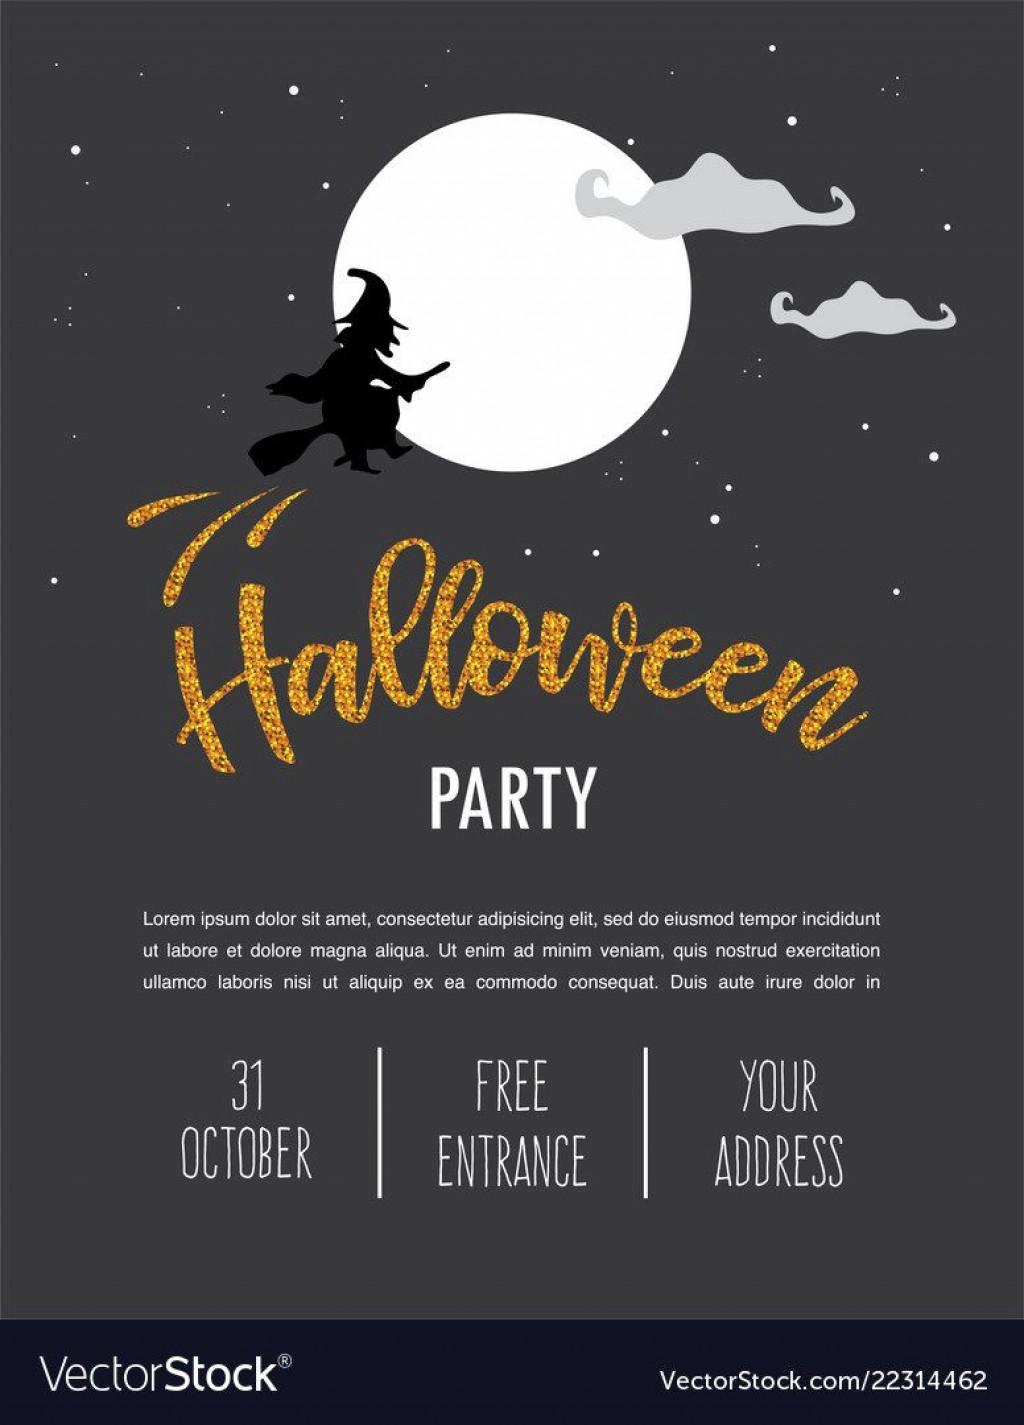 009 Rare Halloween Party Invite Template Image  Templates - Free Printable Spooky Invitation BirthdayLarge